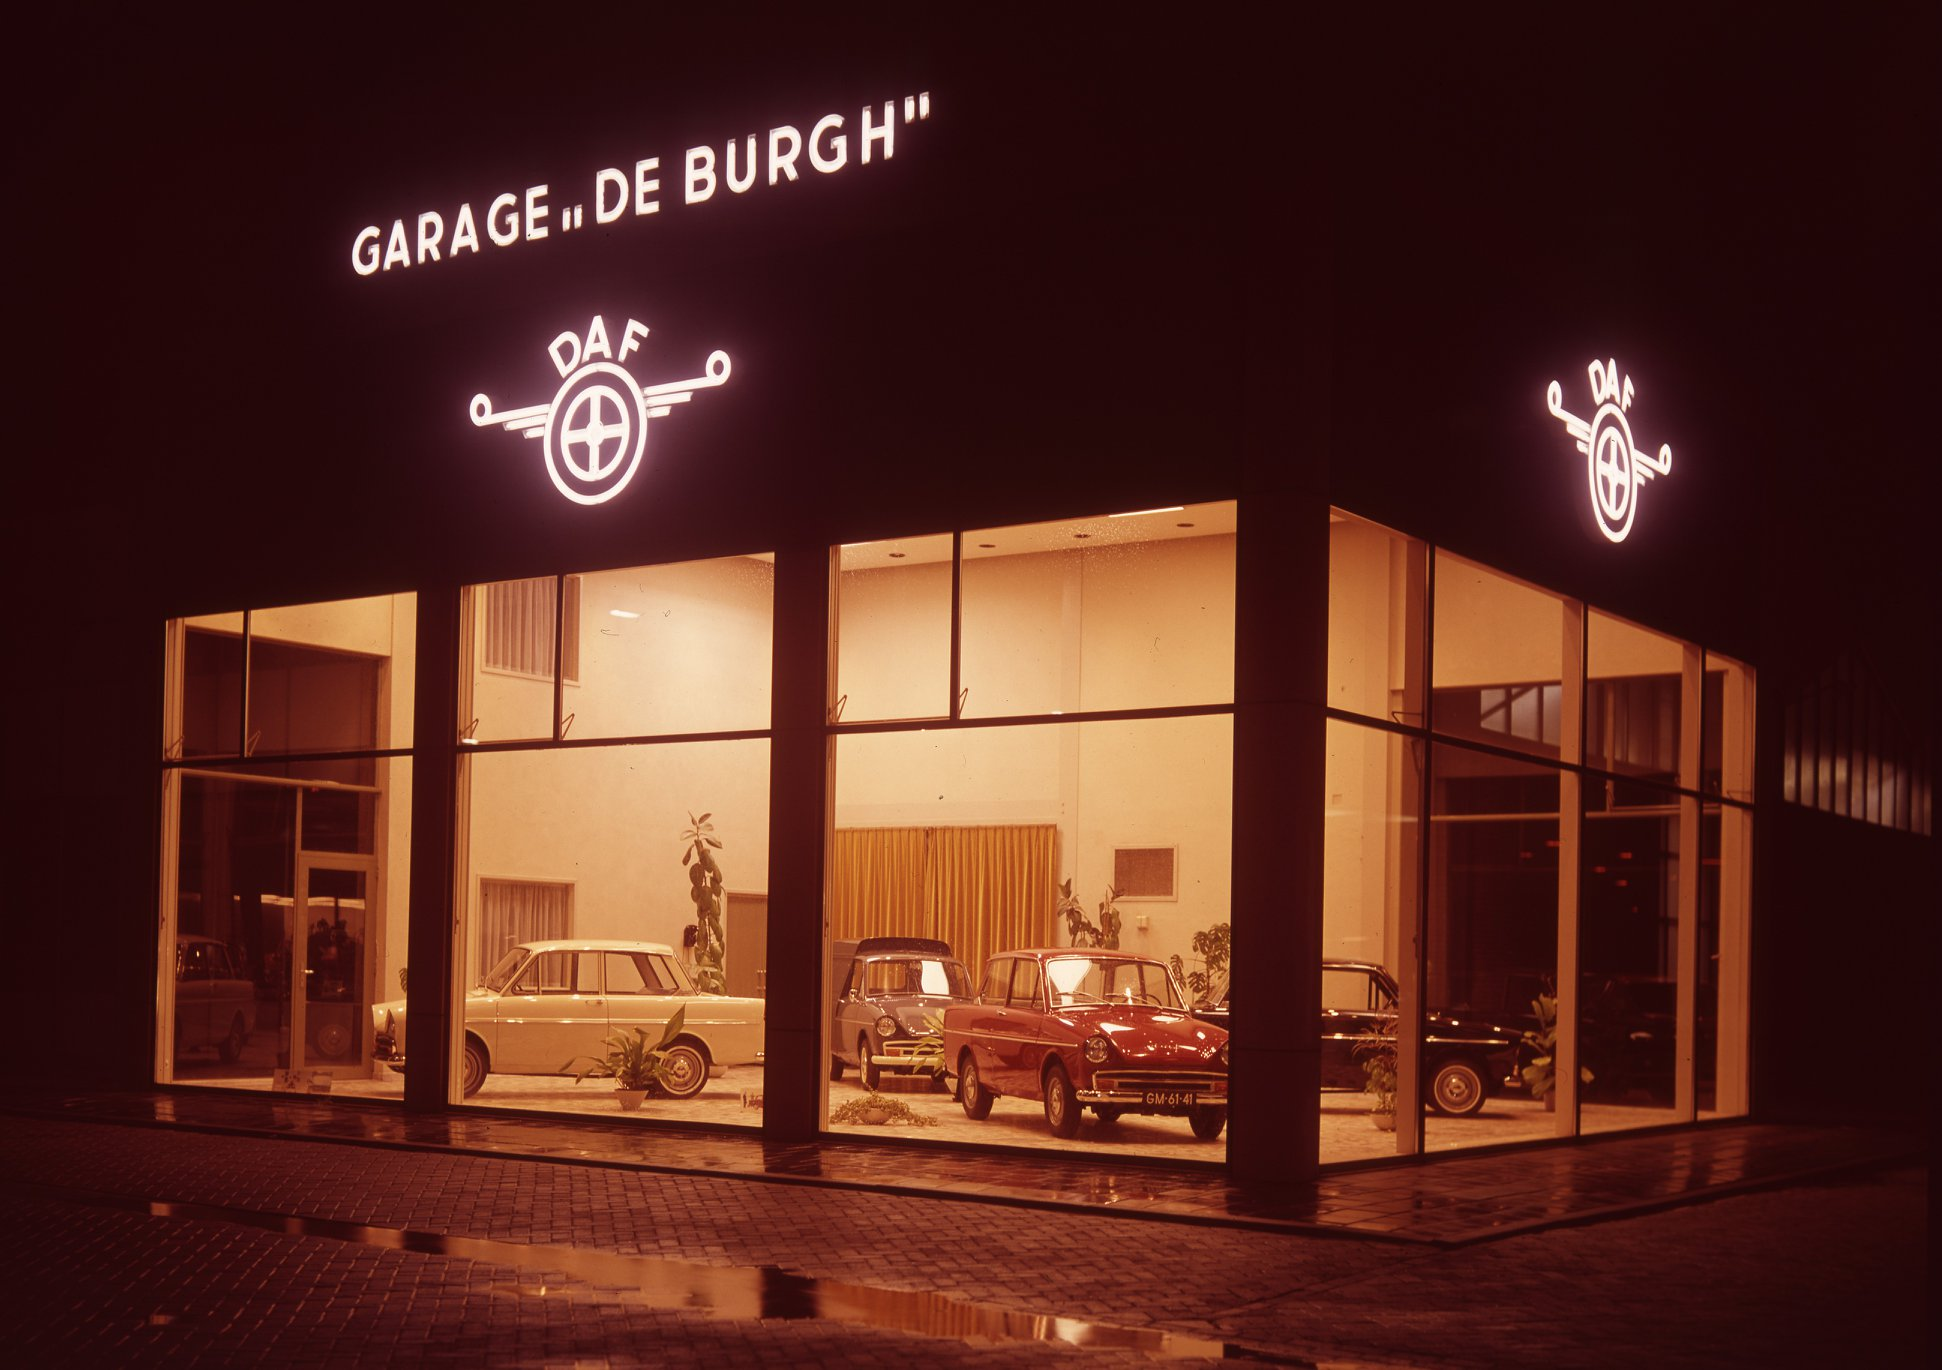 Garage--De-Burgh-1964